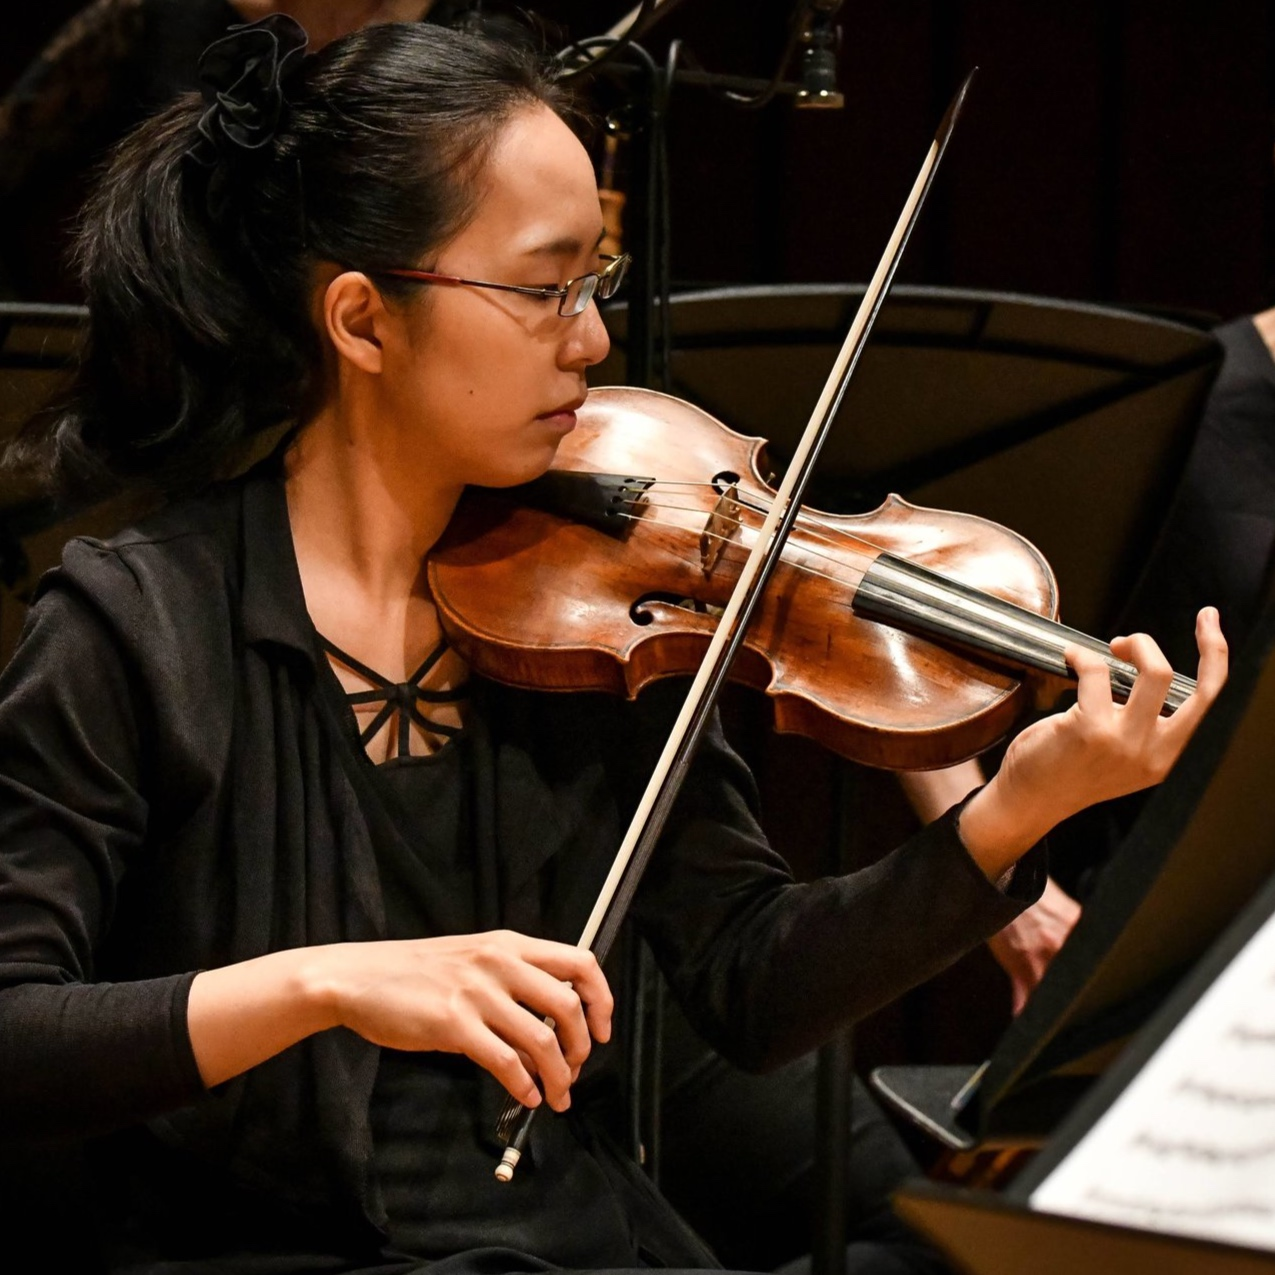 Marie TORIU鳥生真理絵 - Baroque Violin | 巴洛克小提琴